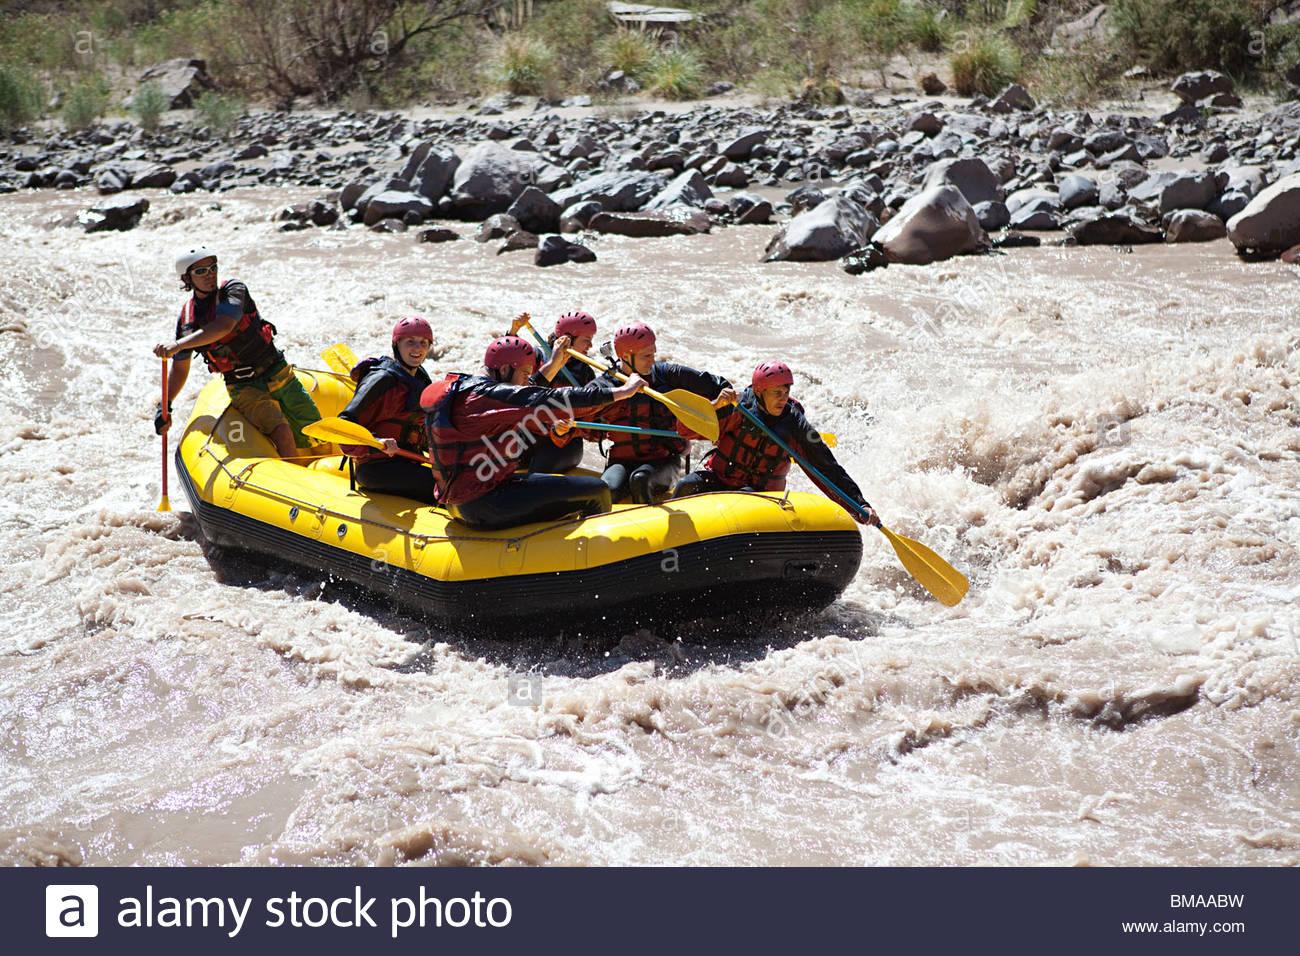 People white water rafting - Stock Image